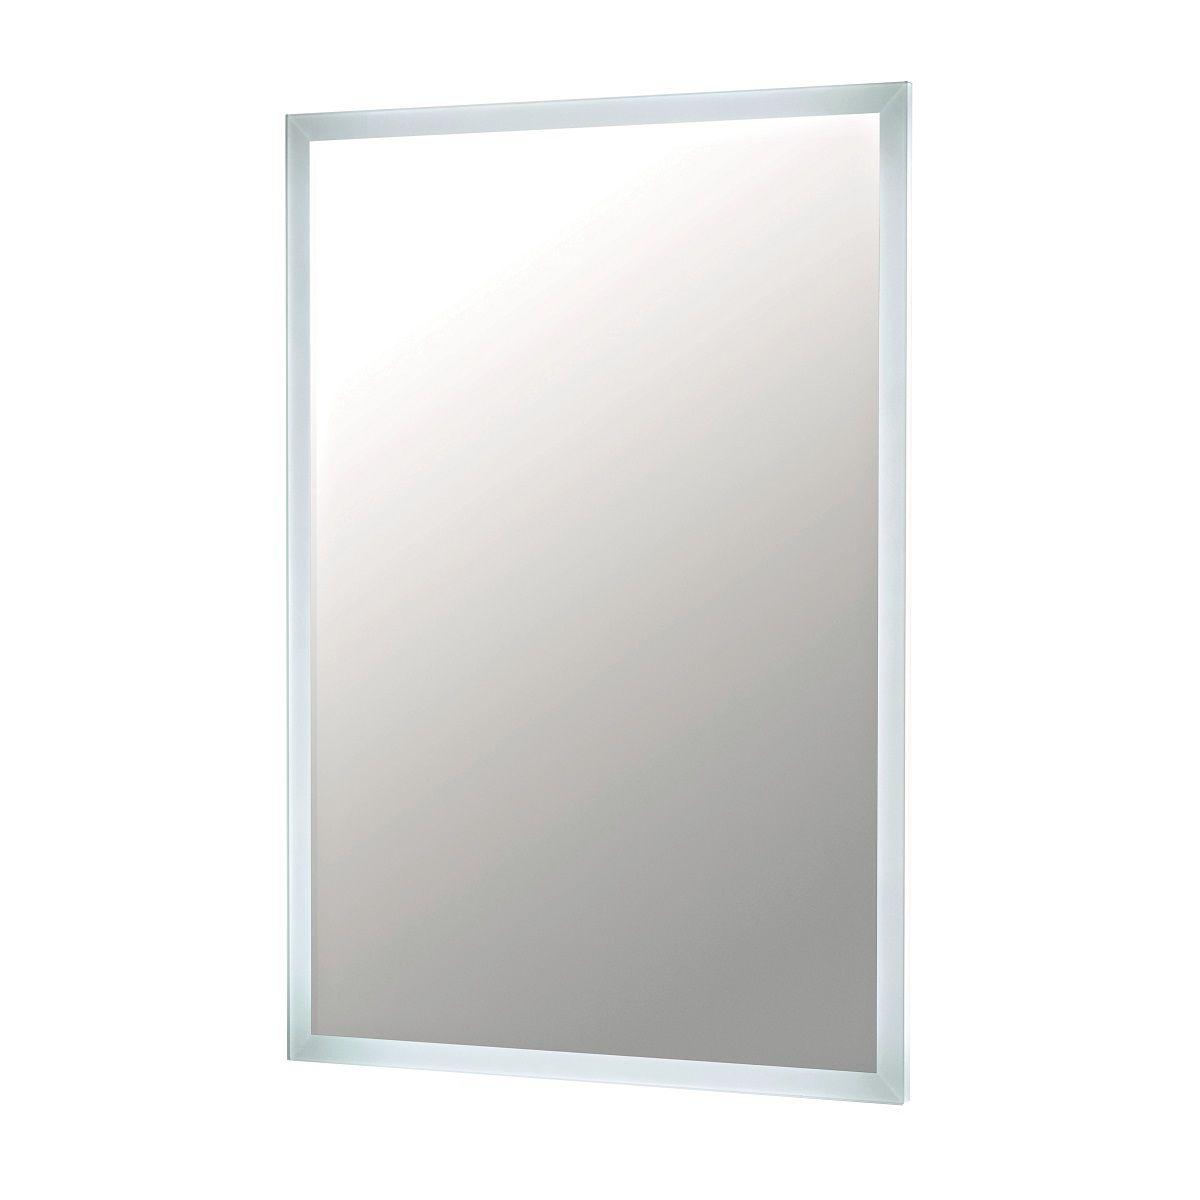 UK Bathrooms Essentials Kingstonia 500 x 700mm LED Mirror - UKBESSM0011